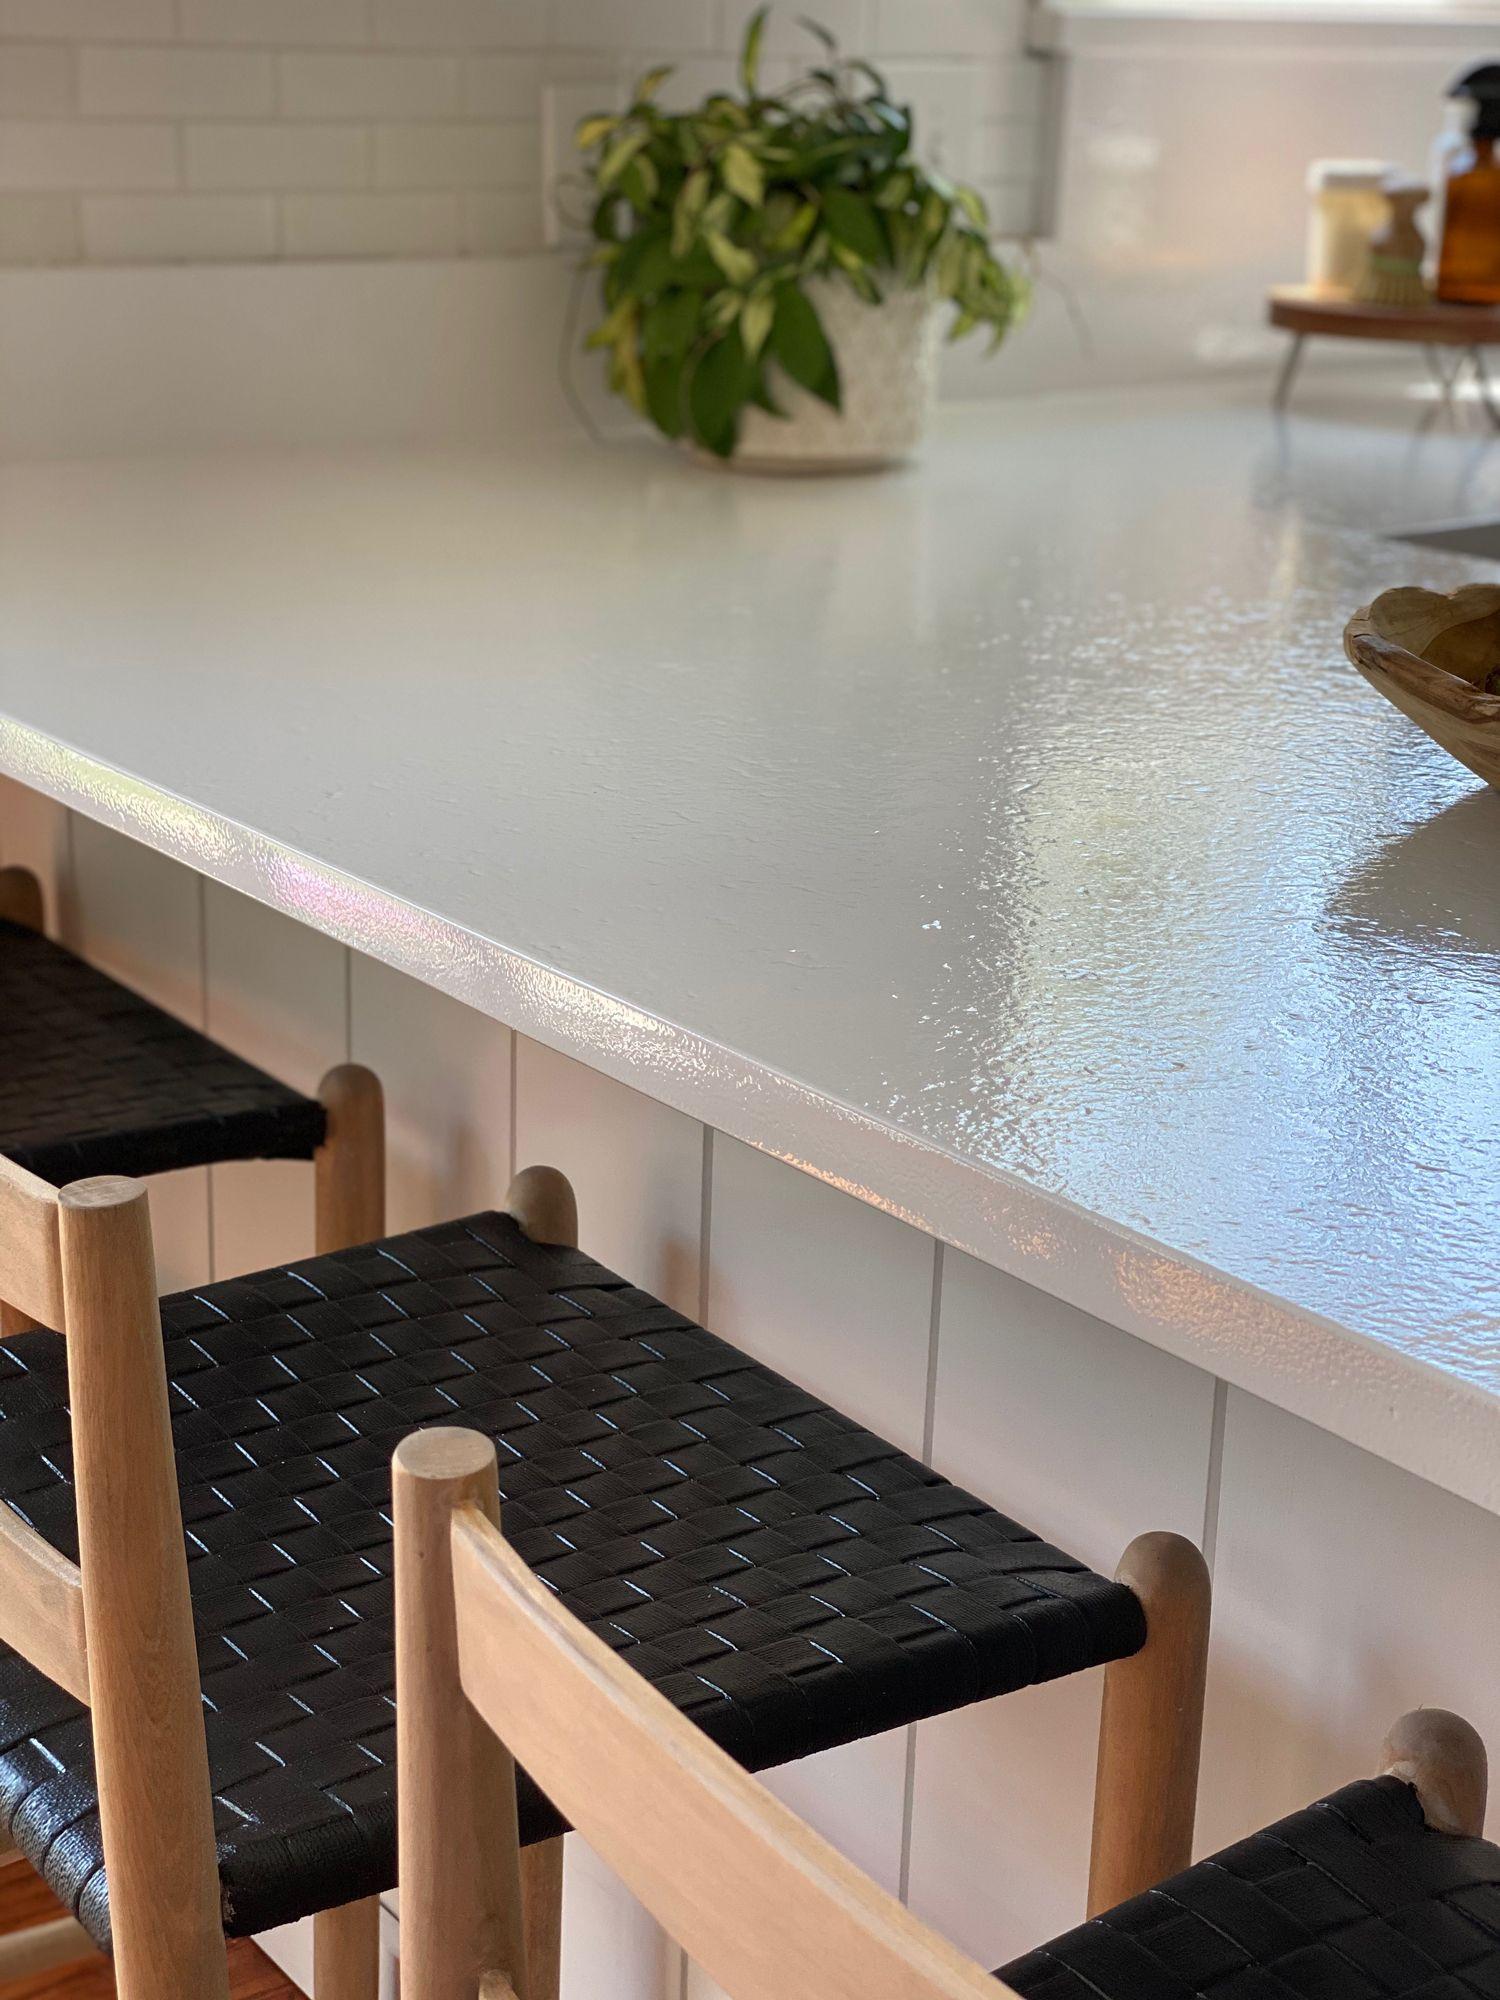 Appliance Epoxy Kitchen Counter Makeover Full Hearted Home Kitchen Counter Diy Countertops Countertop Makeover